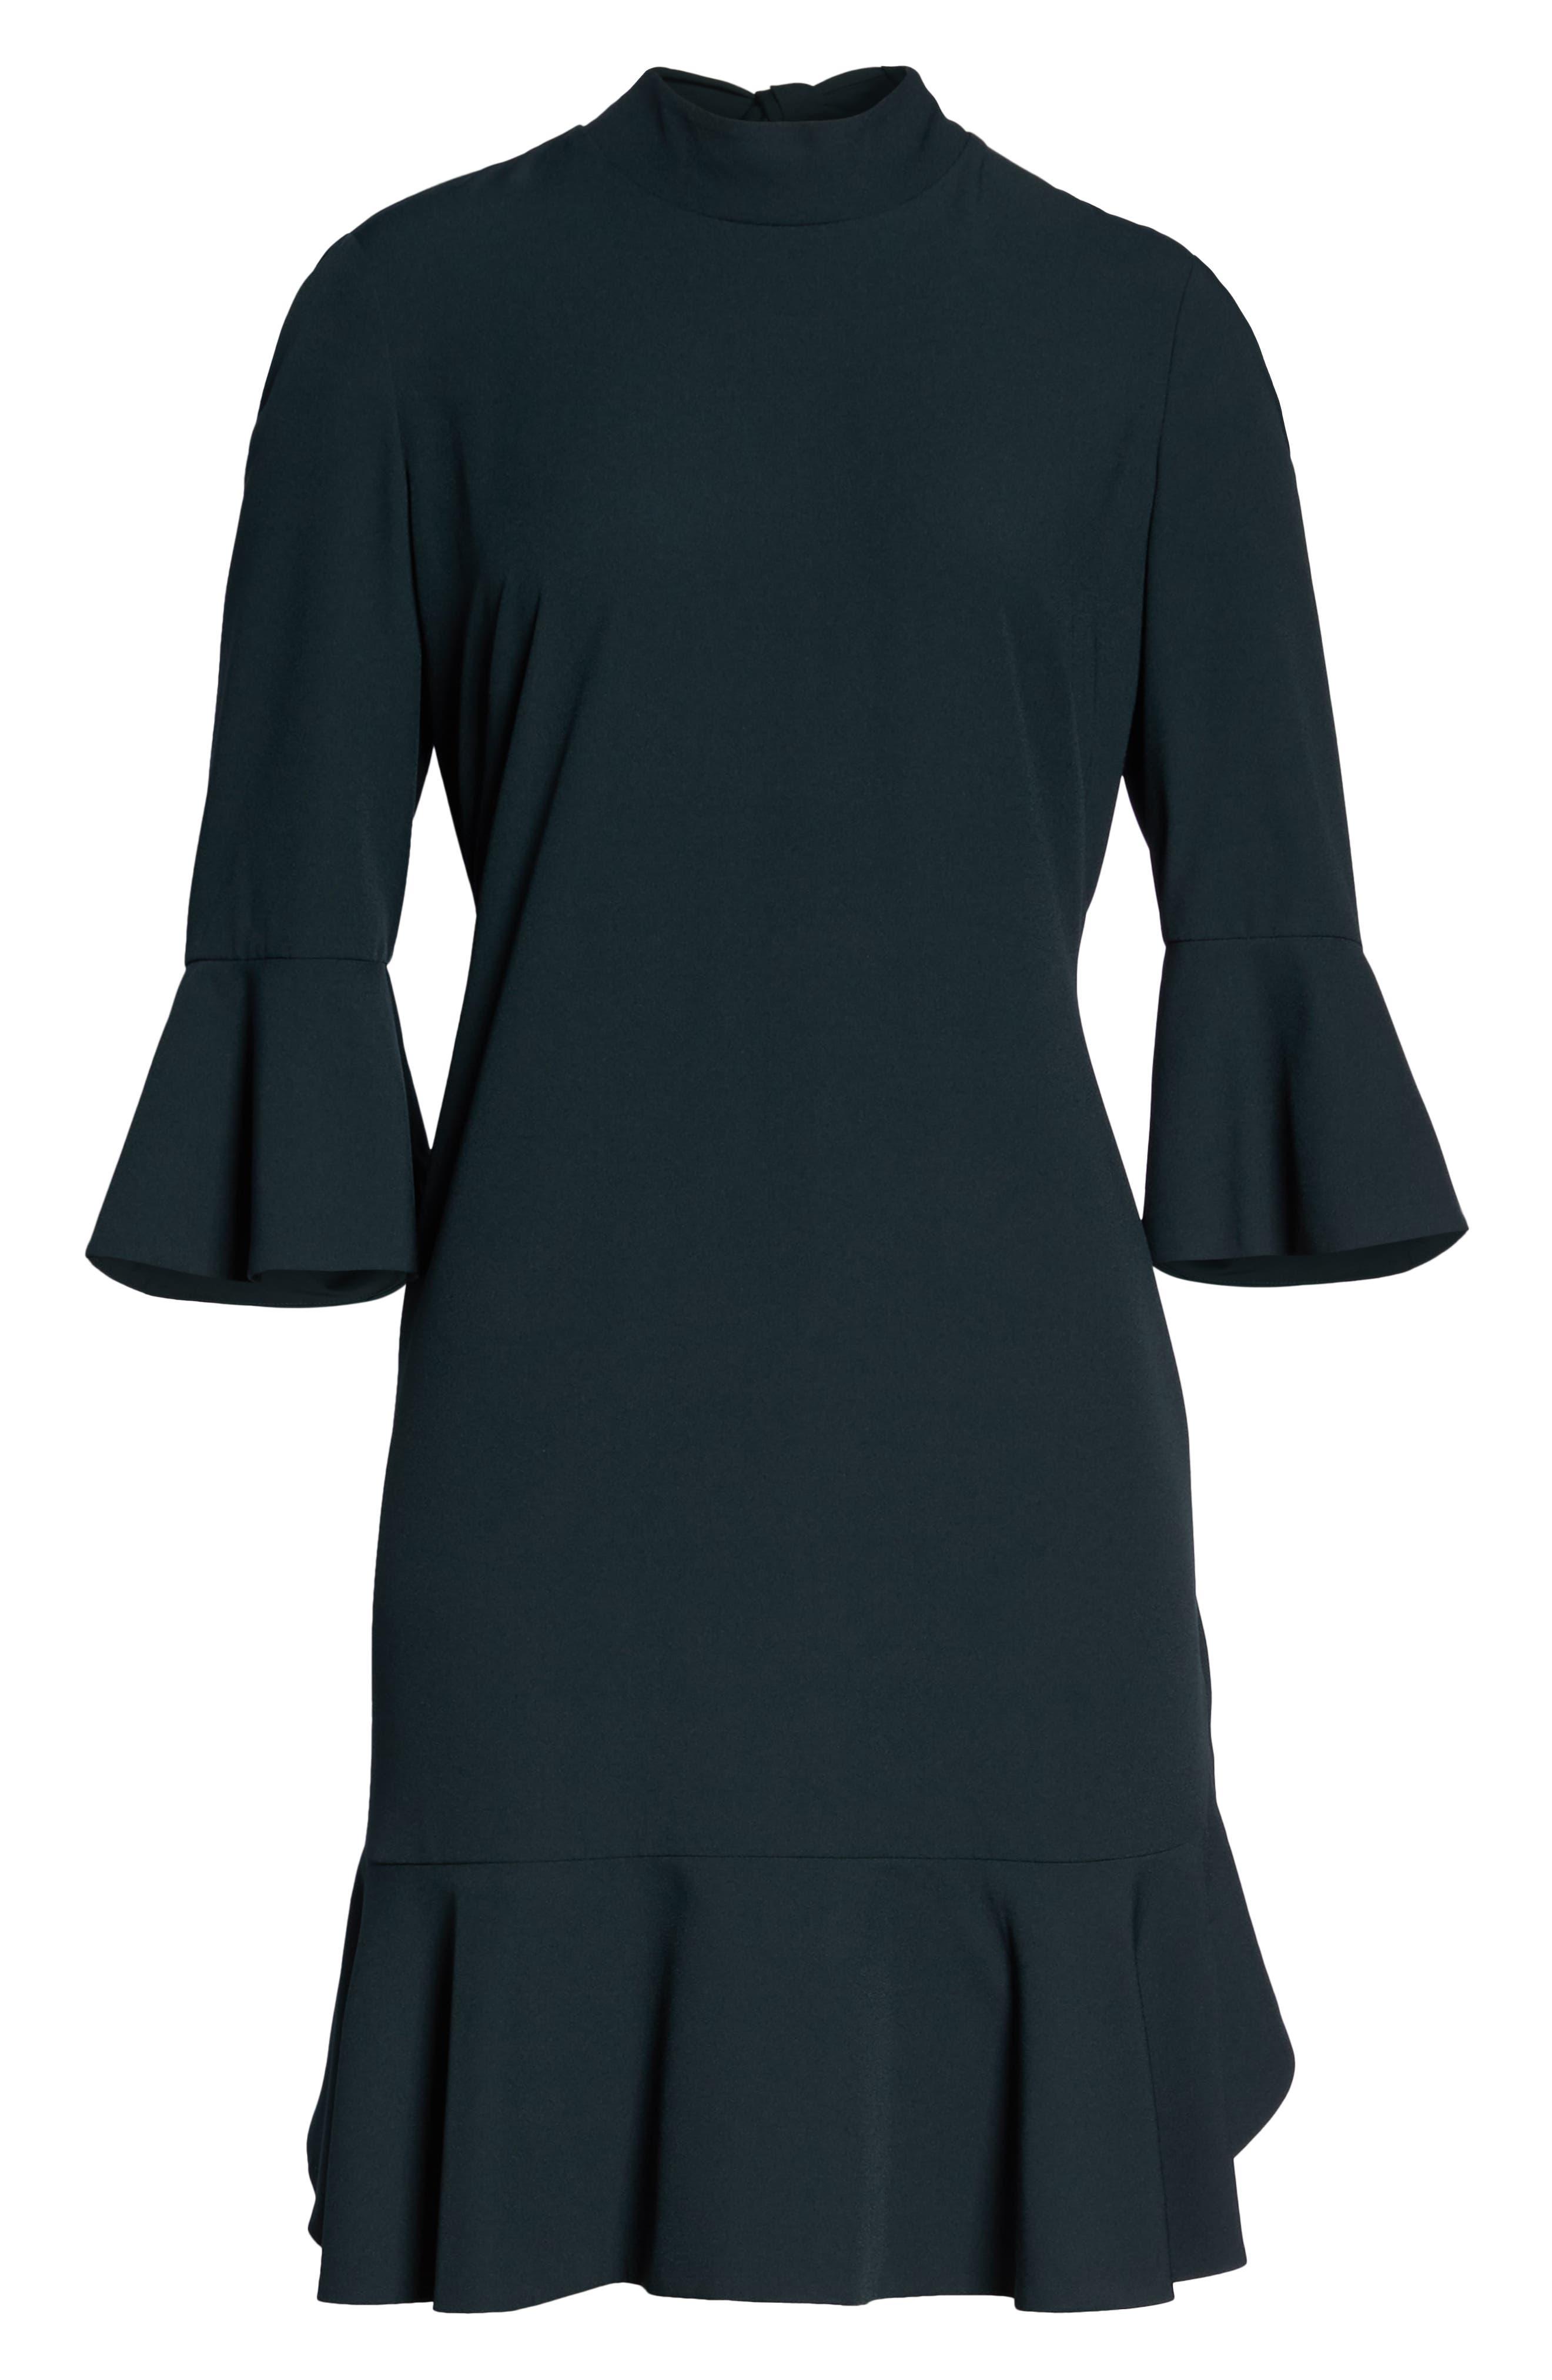 Bell Sleeve Dress,                             Alternate thumbnail 7, color,                             GREEN BUG